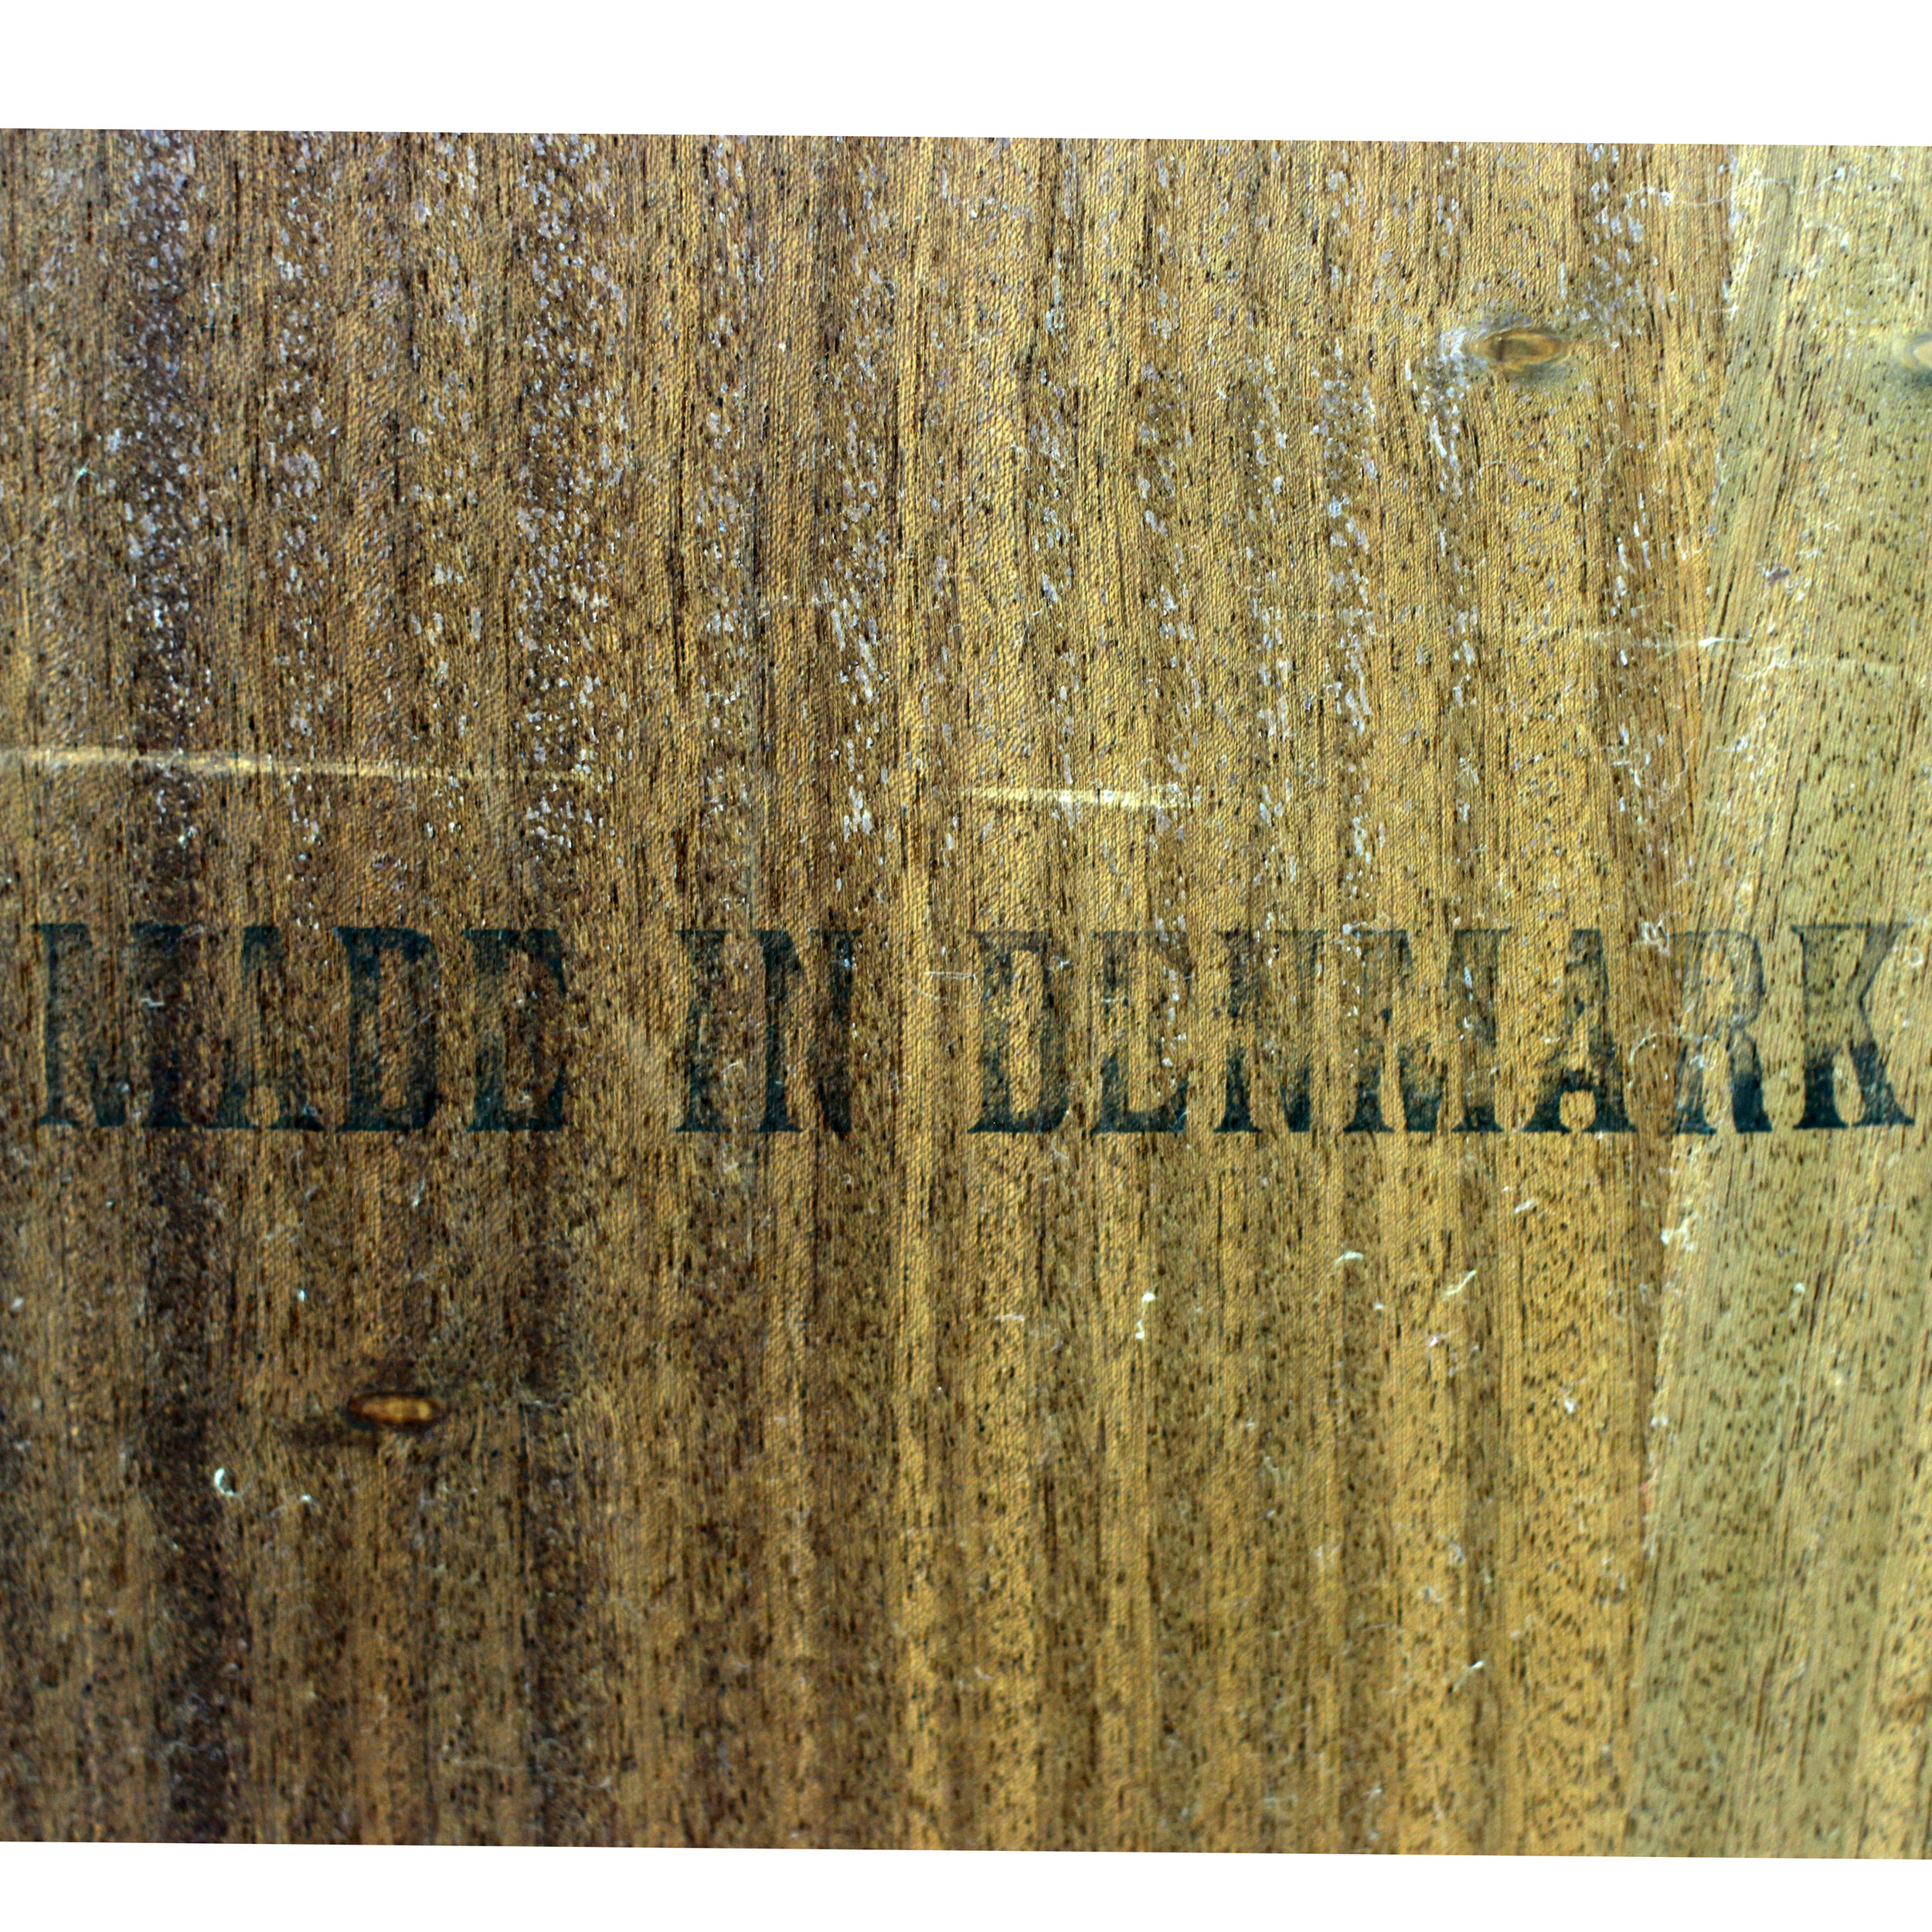 Danish Teak 12 Drawer Dresser by Dyrlund (2).jpg